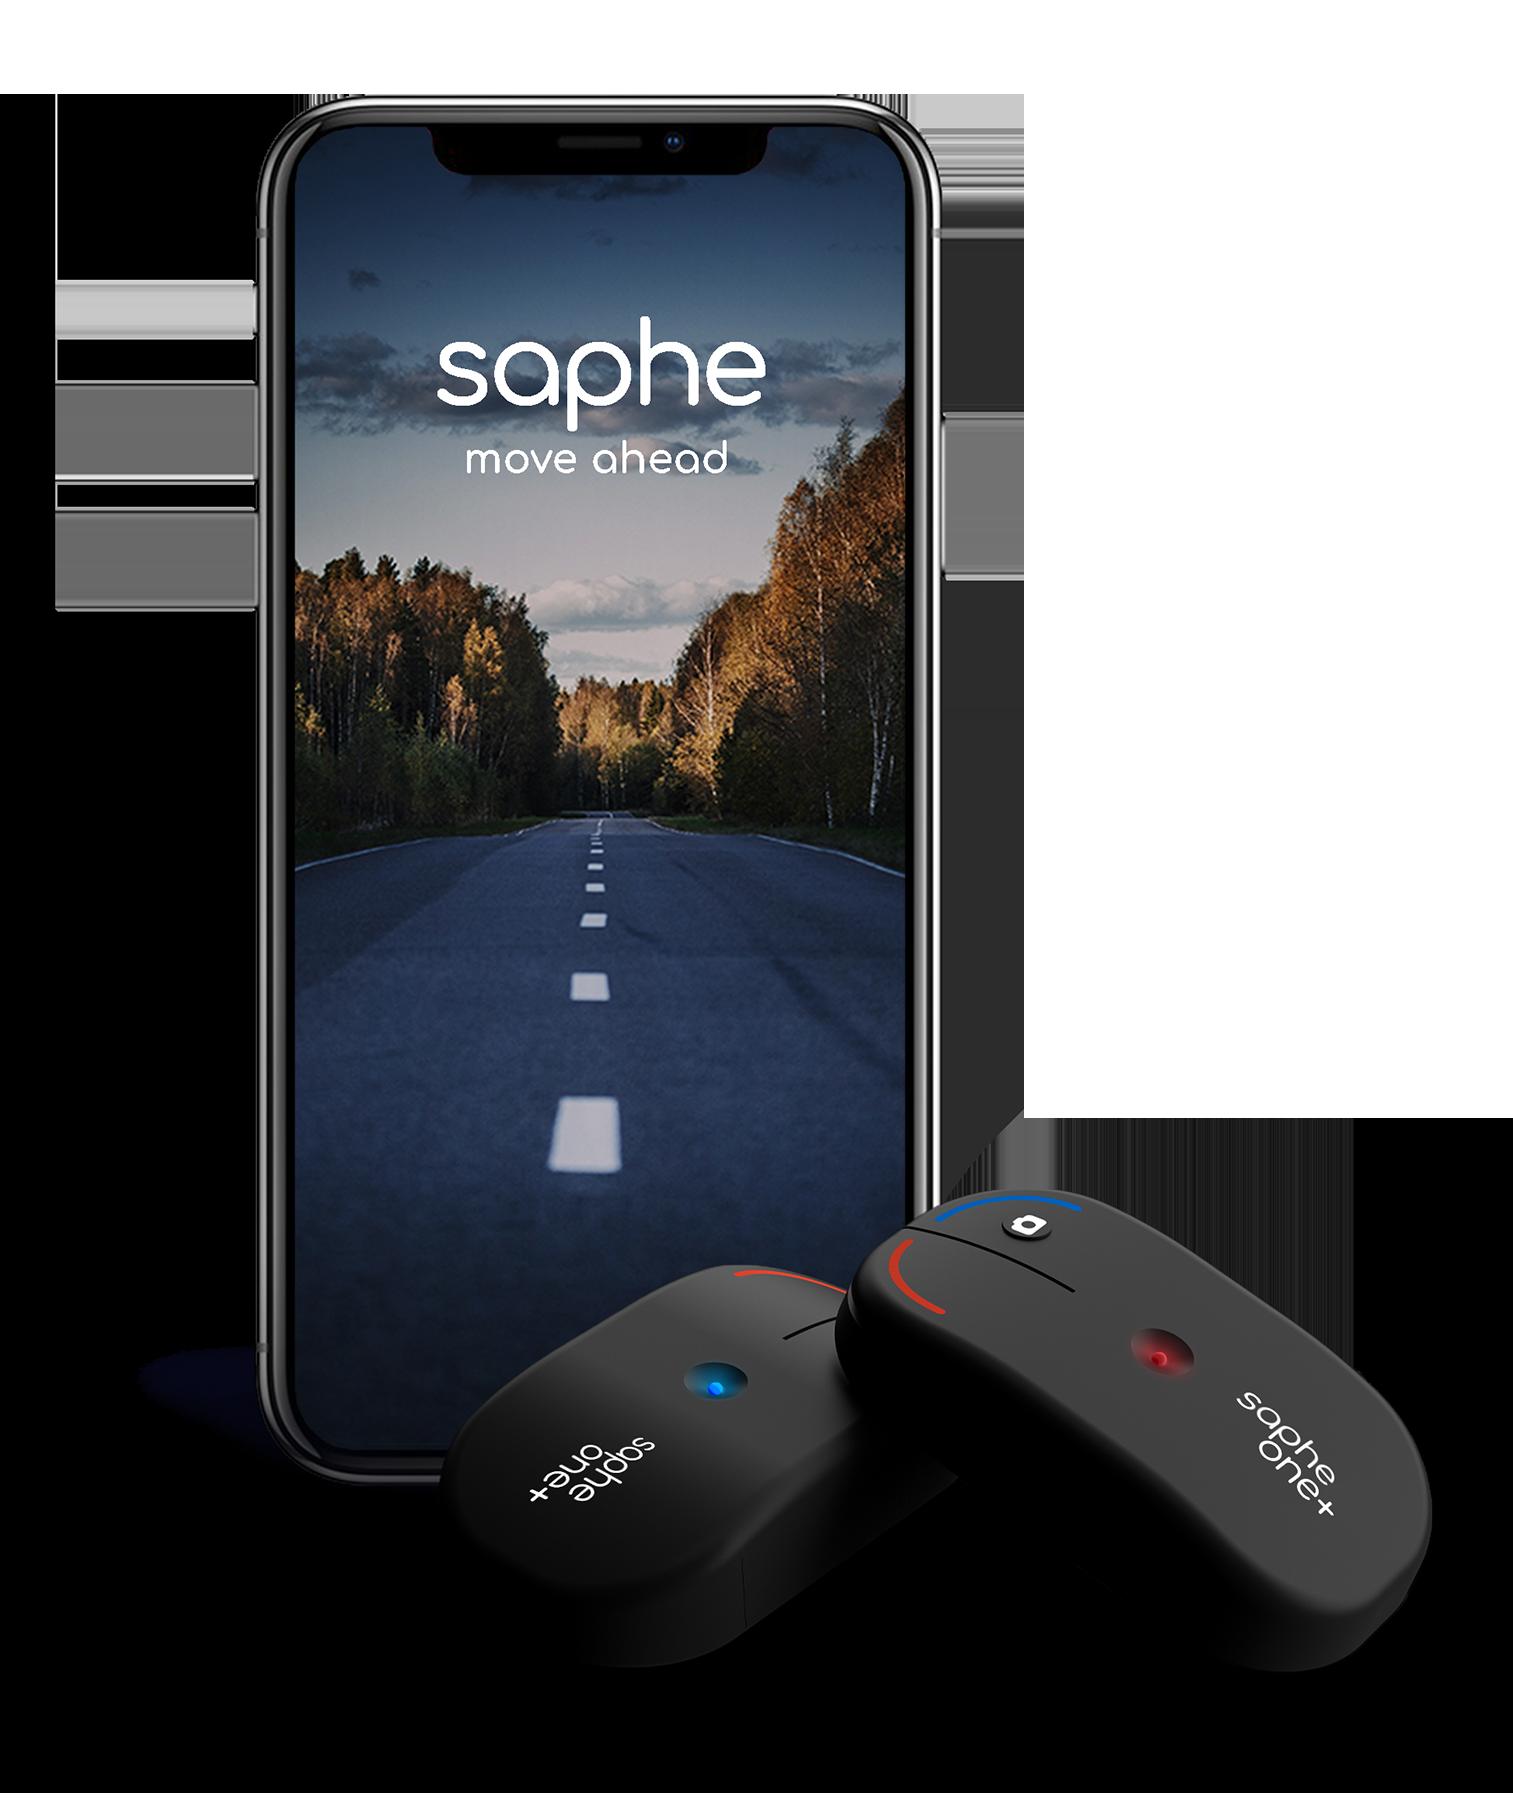 immagine app per iphone saphe assieme a saphe one+